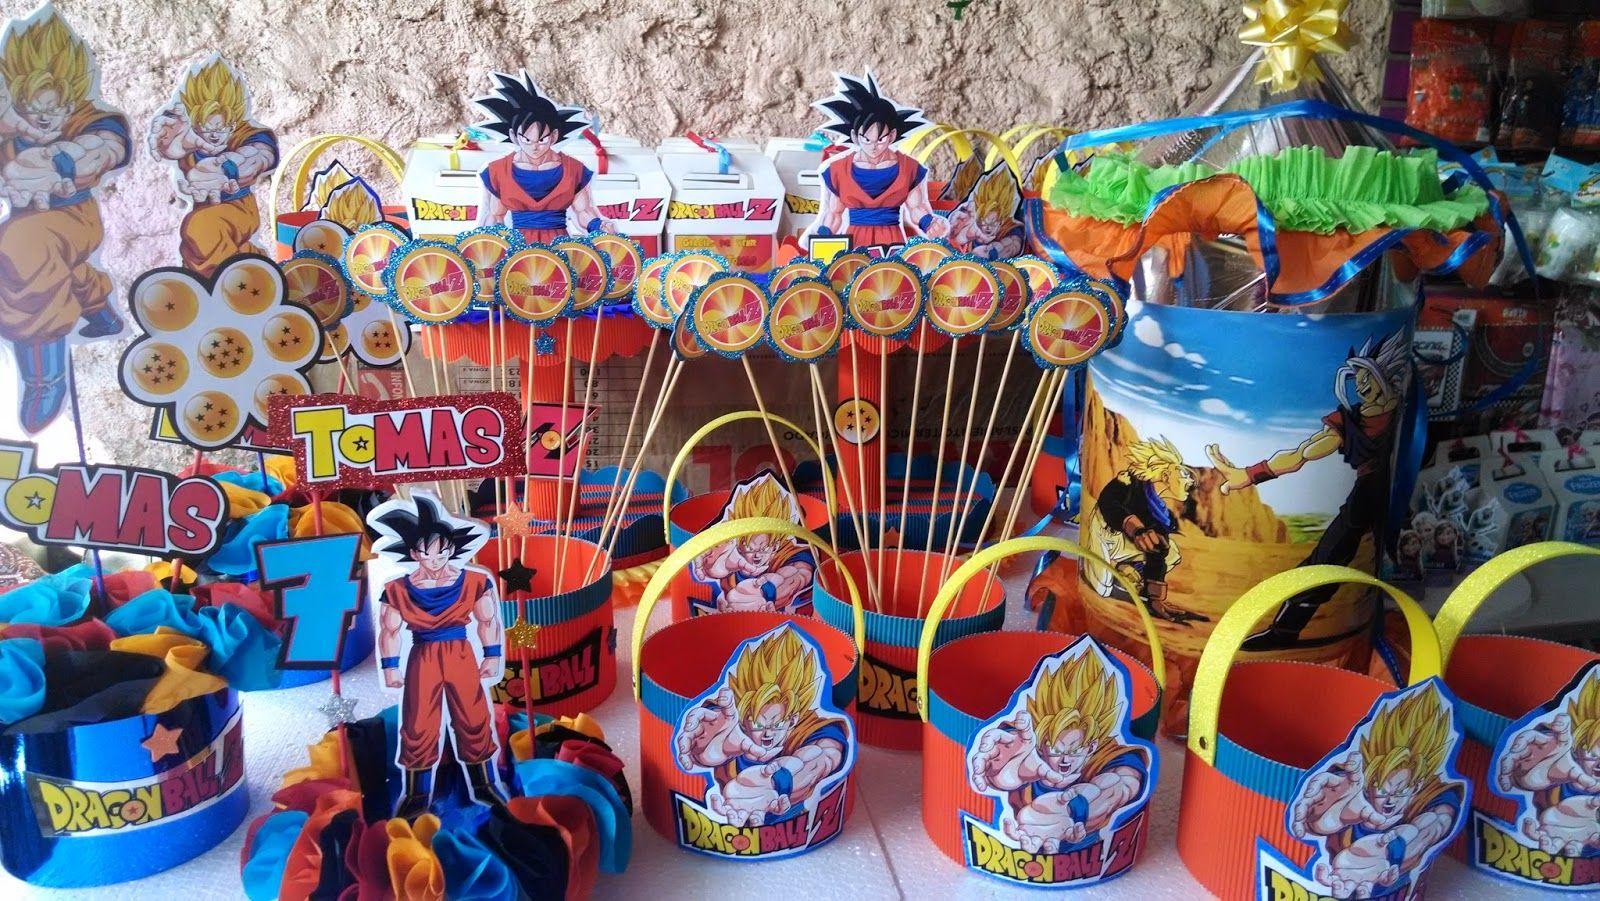 Dragon Ball Z Birthday Party Supplies Buscar Con Google Dragon Party Goku Birthday Ball Birthday